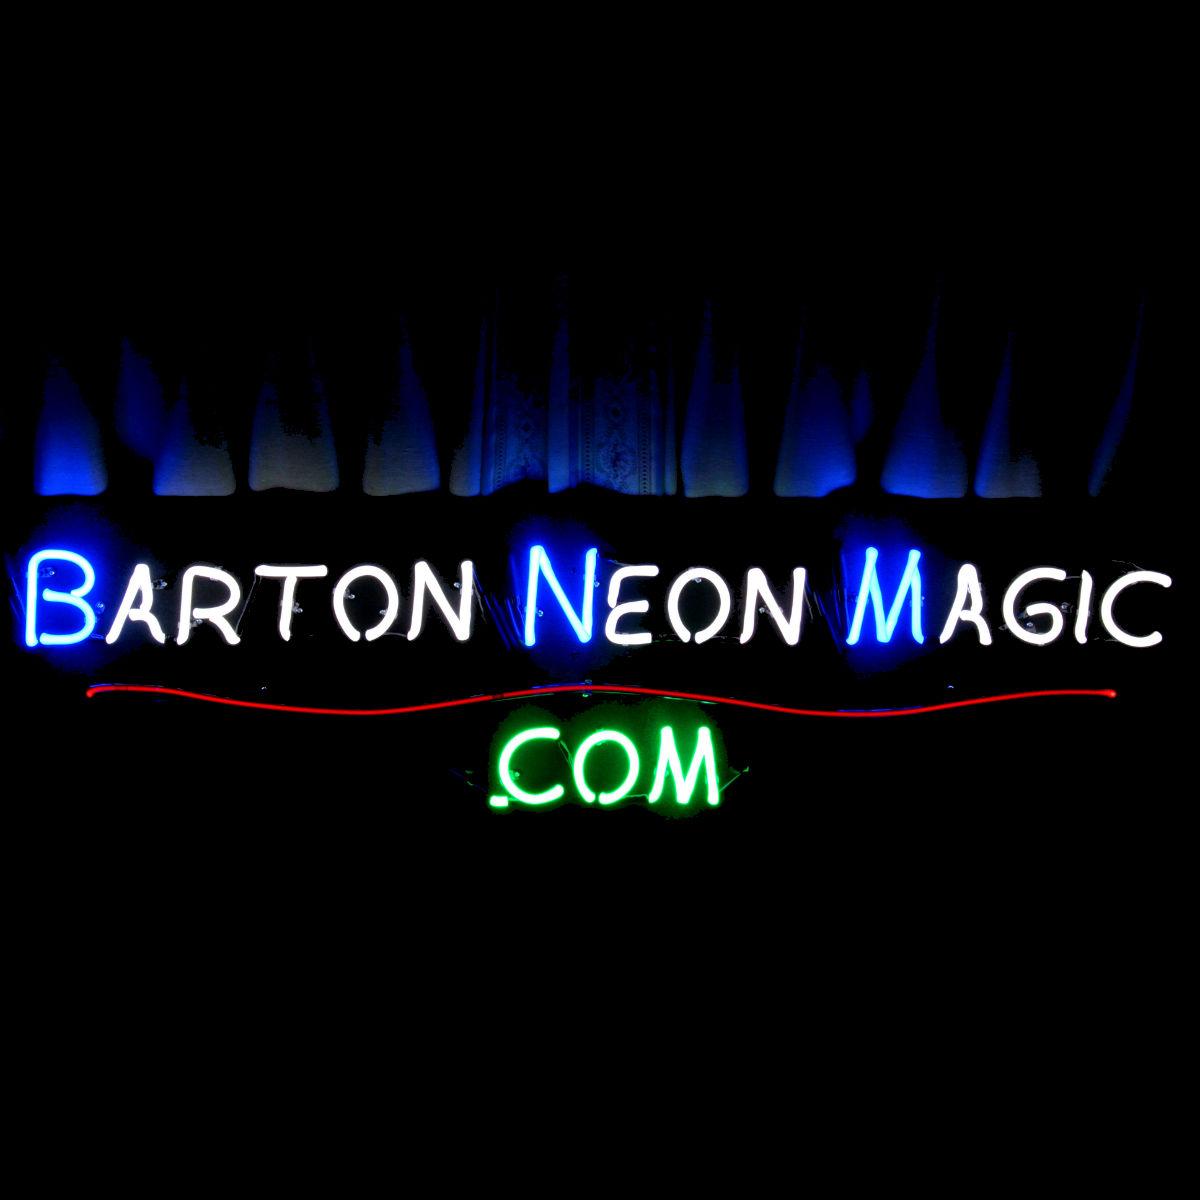 Brilliant Custom Designer Neon Lighting by John Barton - BartonNeonMagic.com